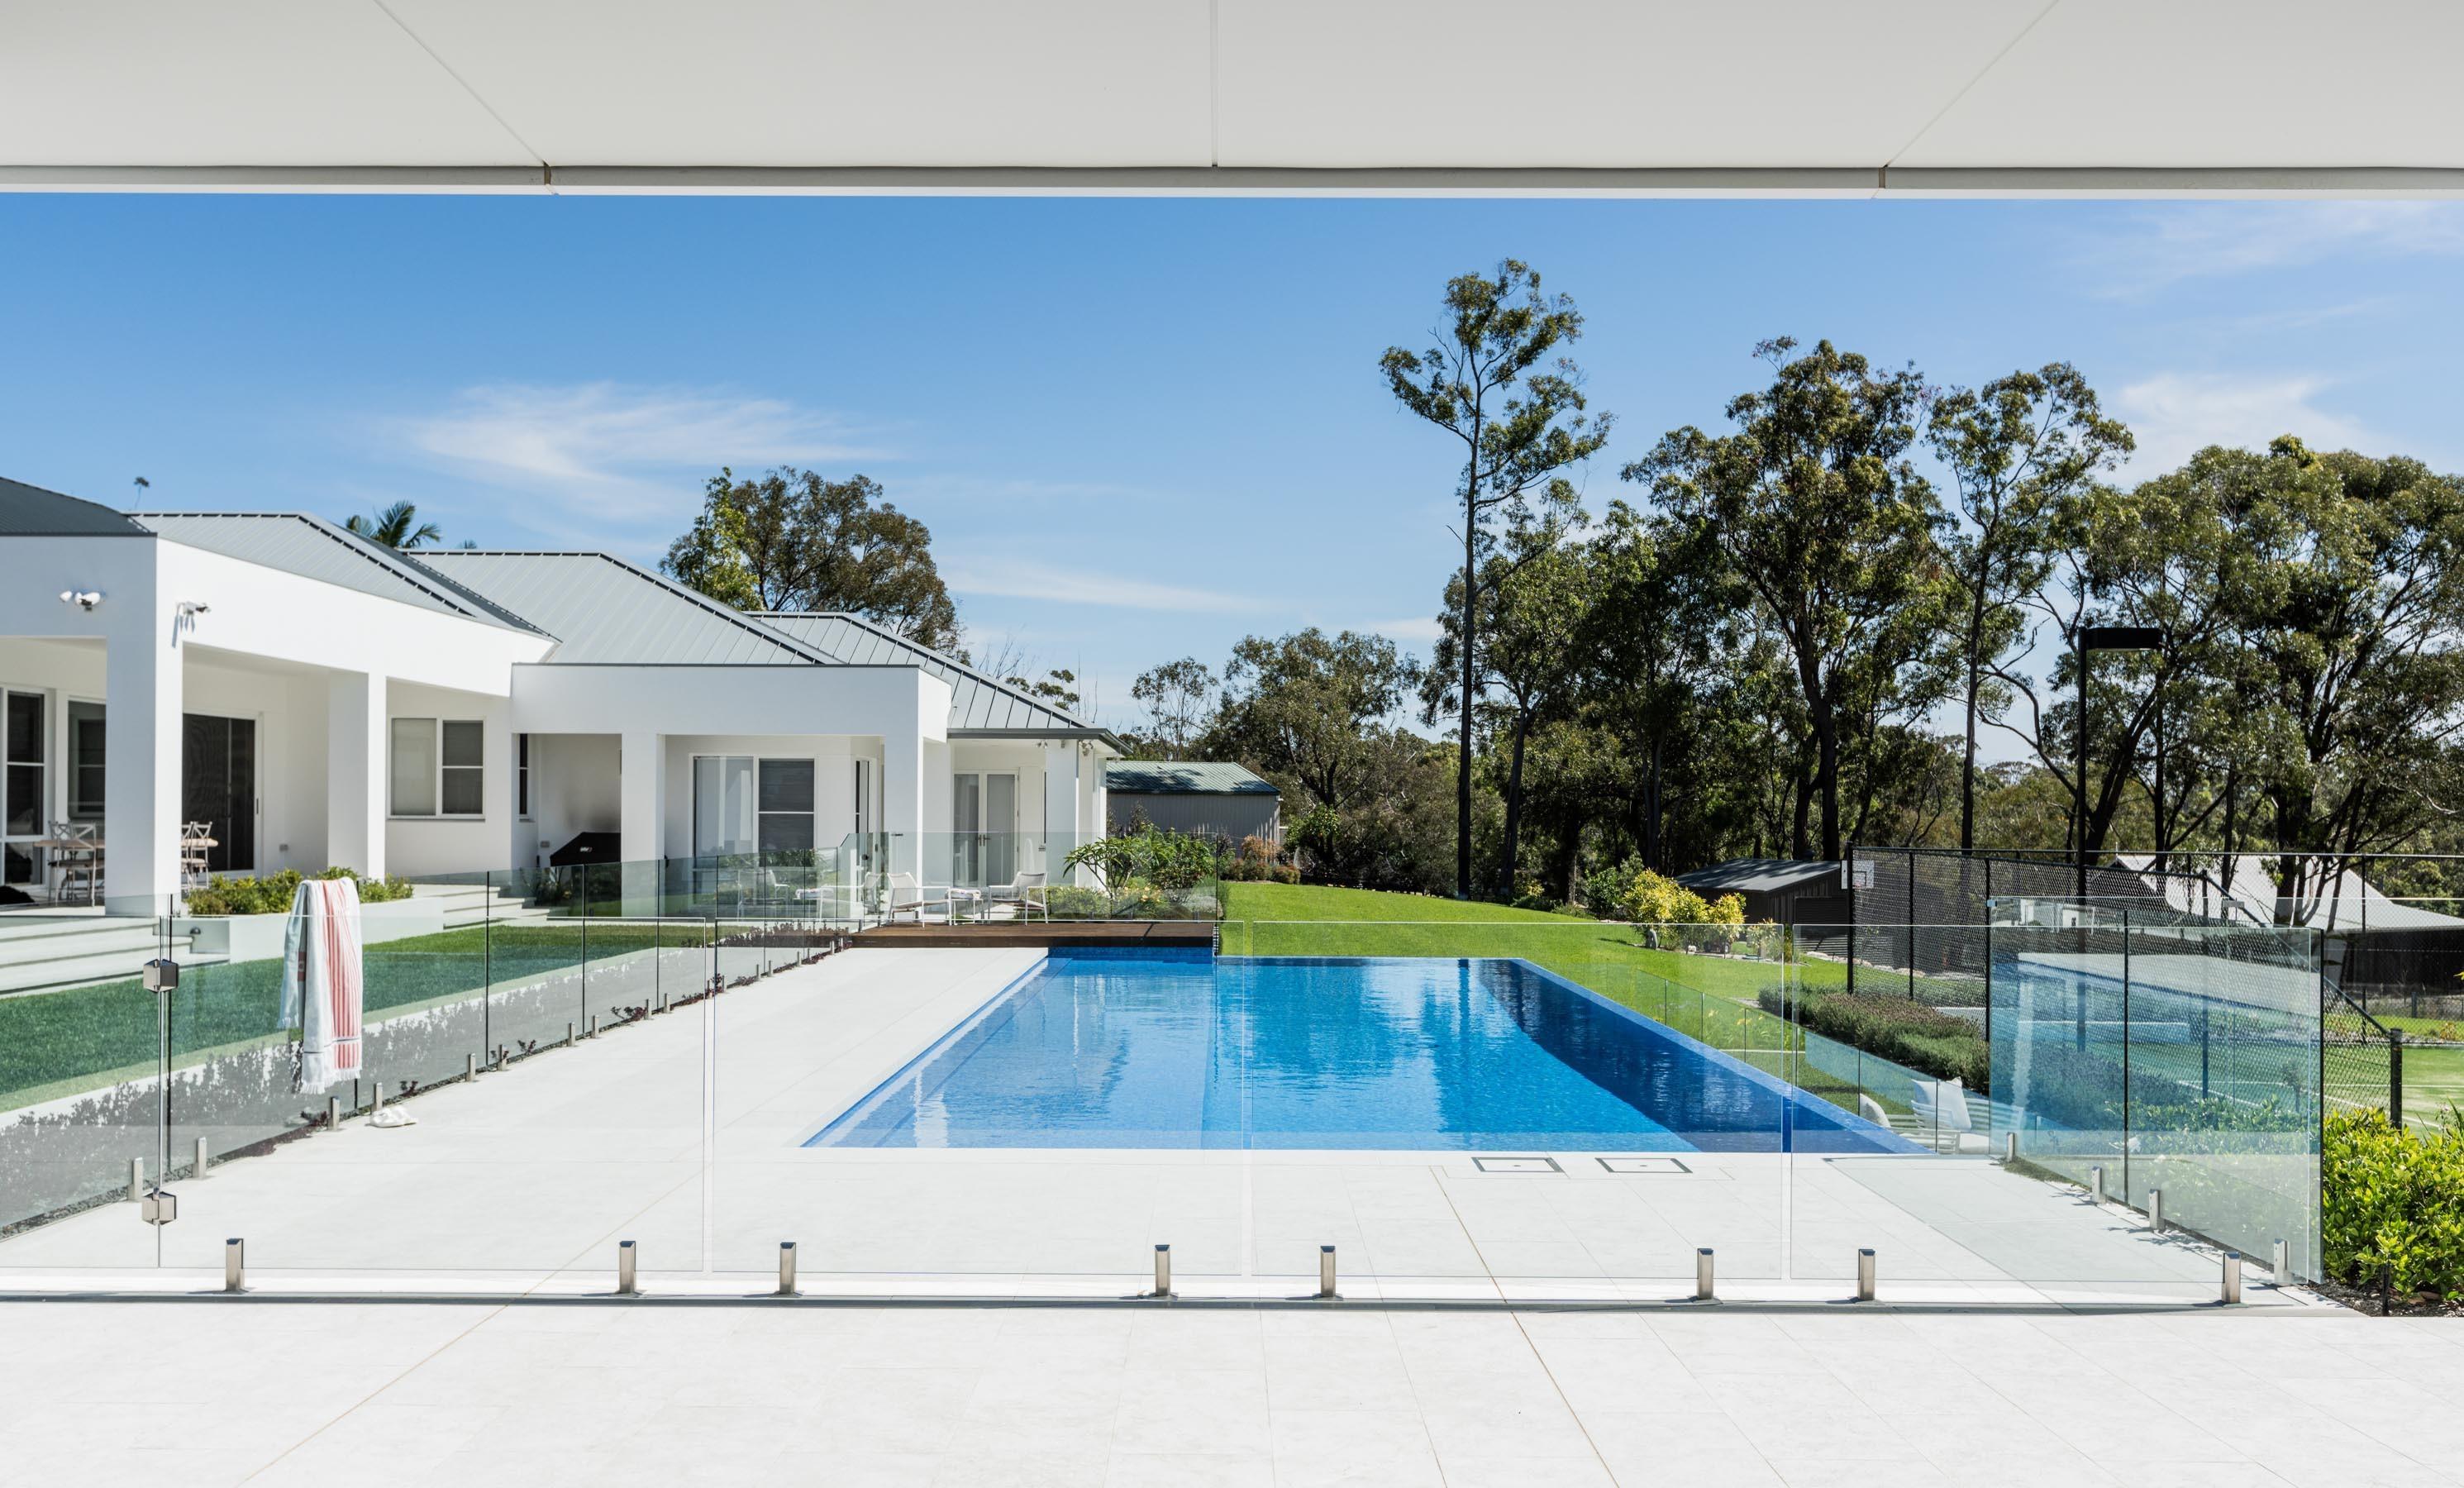 Pool-Tiles Gallery Australian orpheus-02